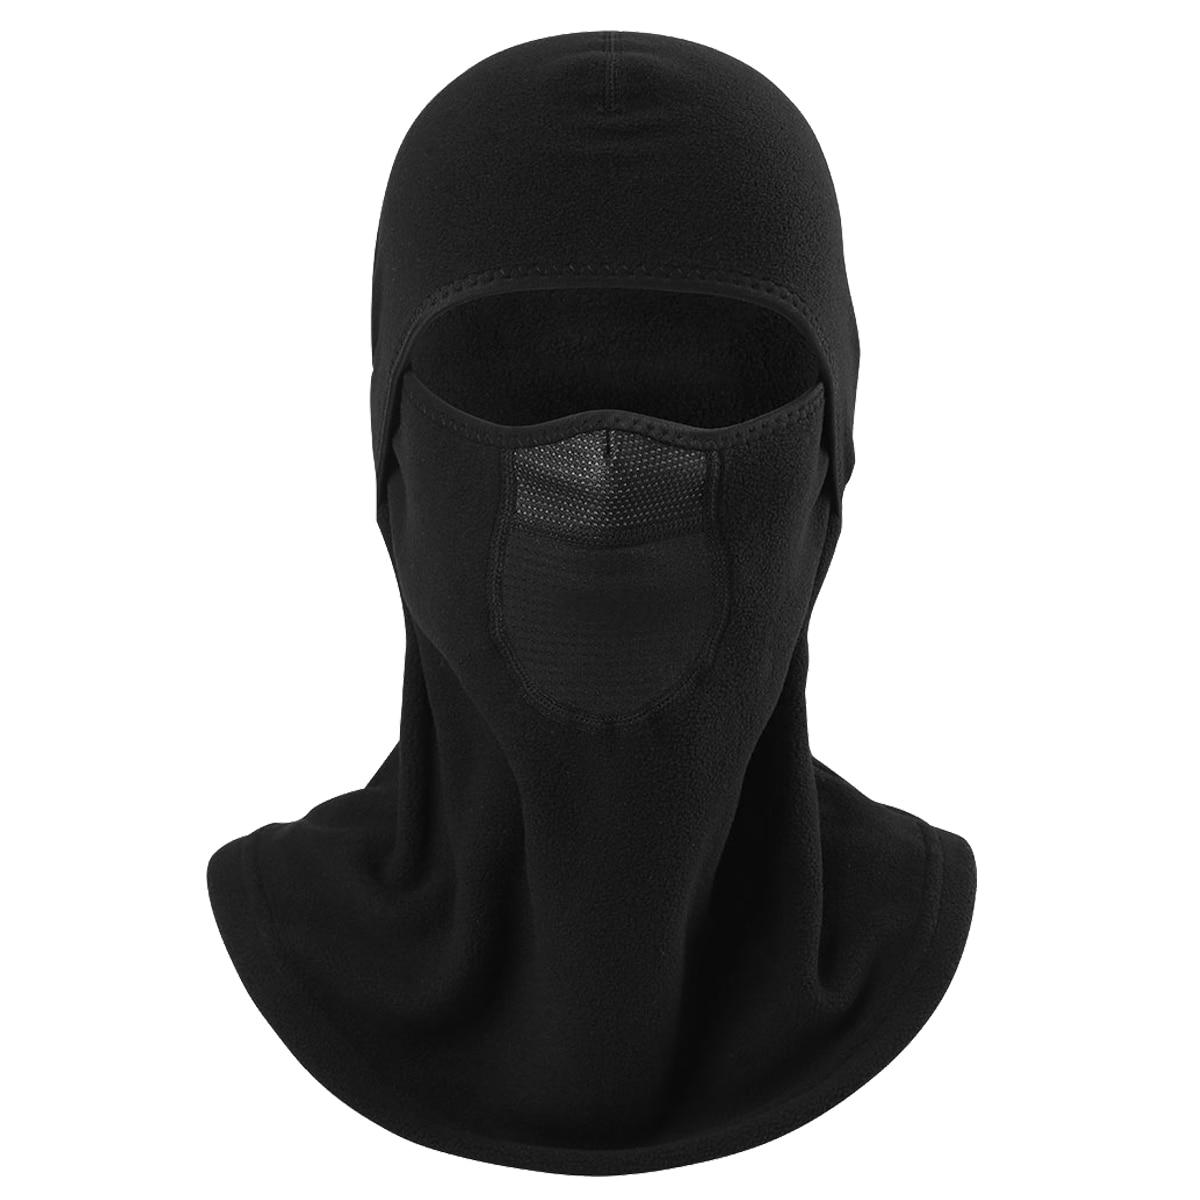 Unisex Balaclava Mask Winter Wool Windproof Cap for Skiing Snowboarding Cycling